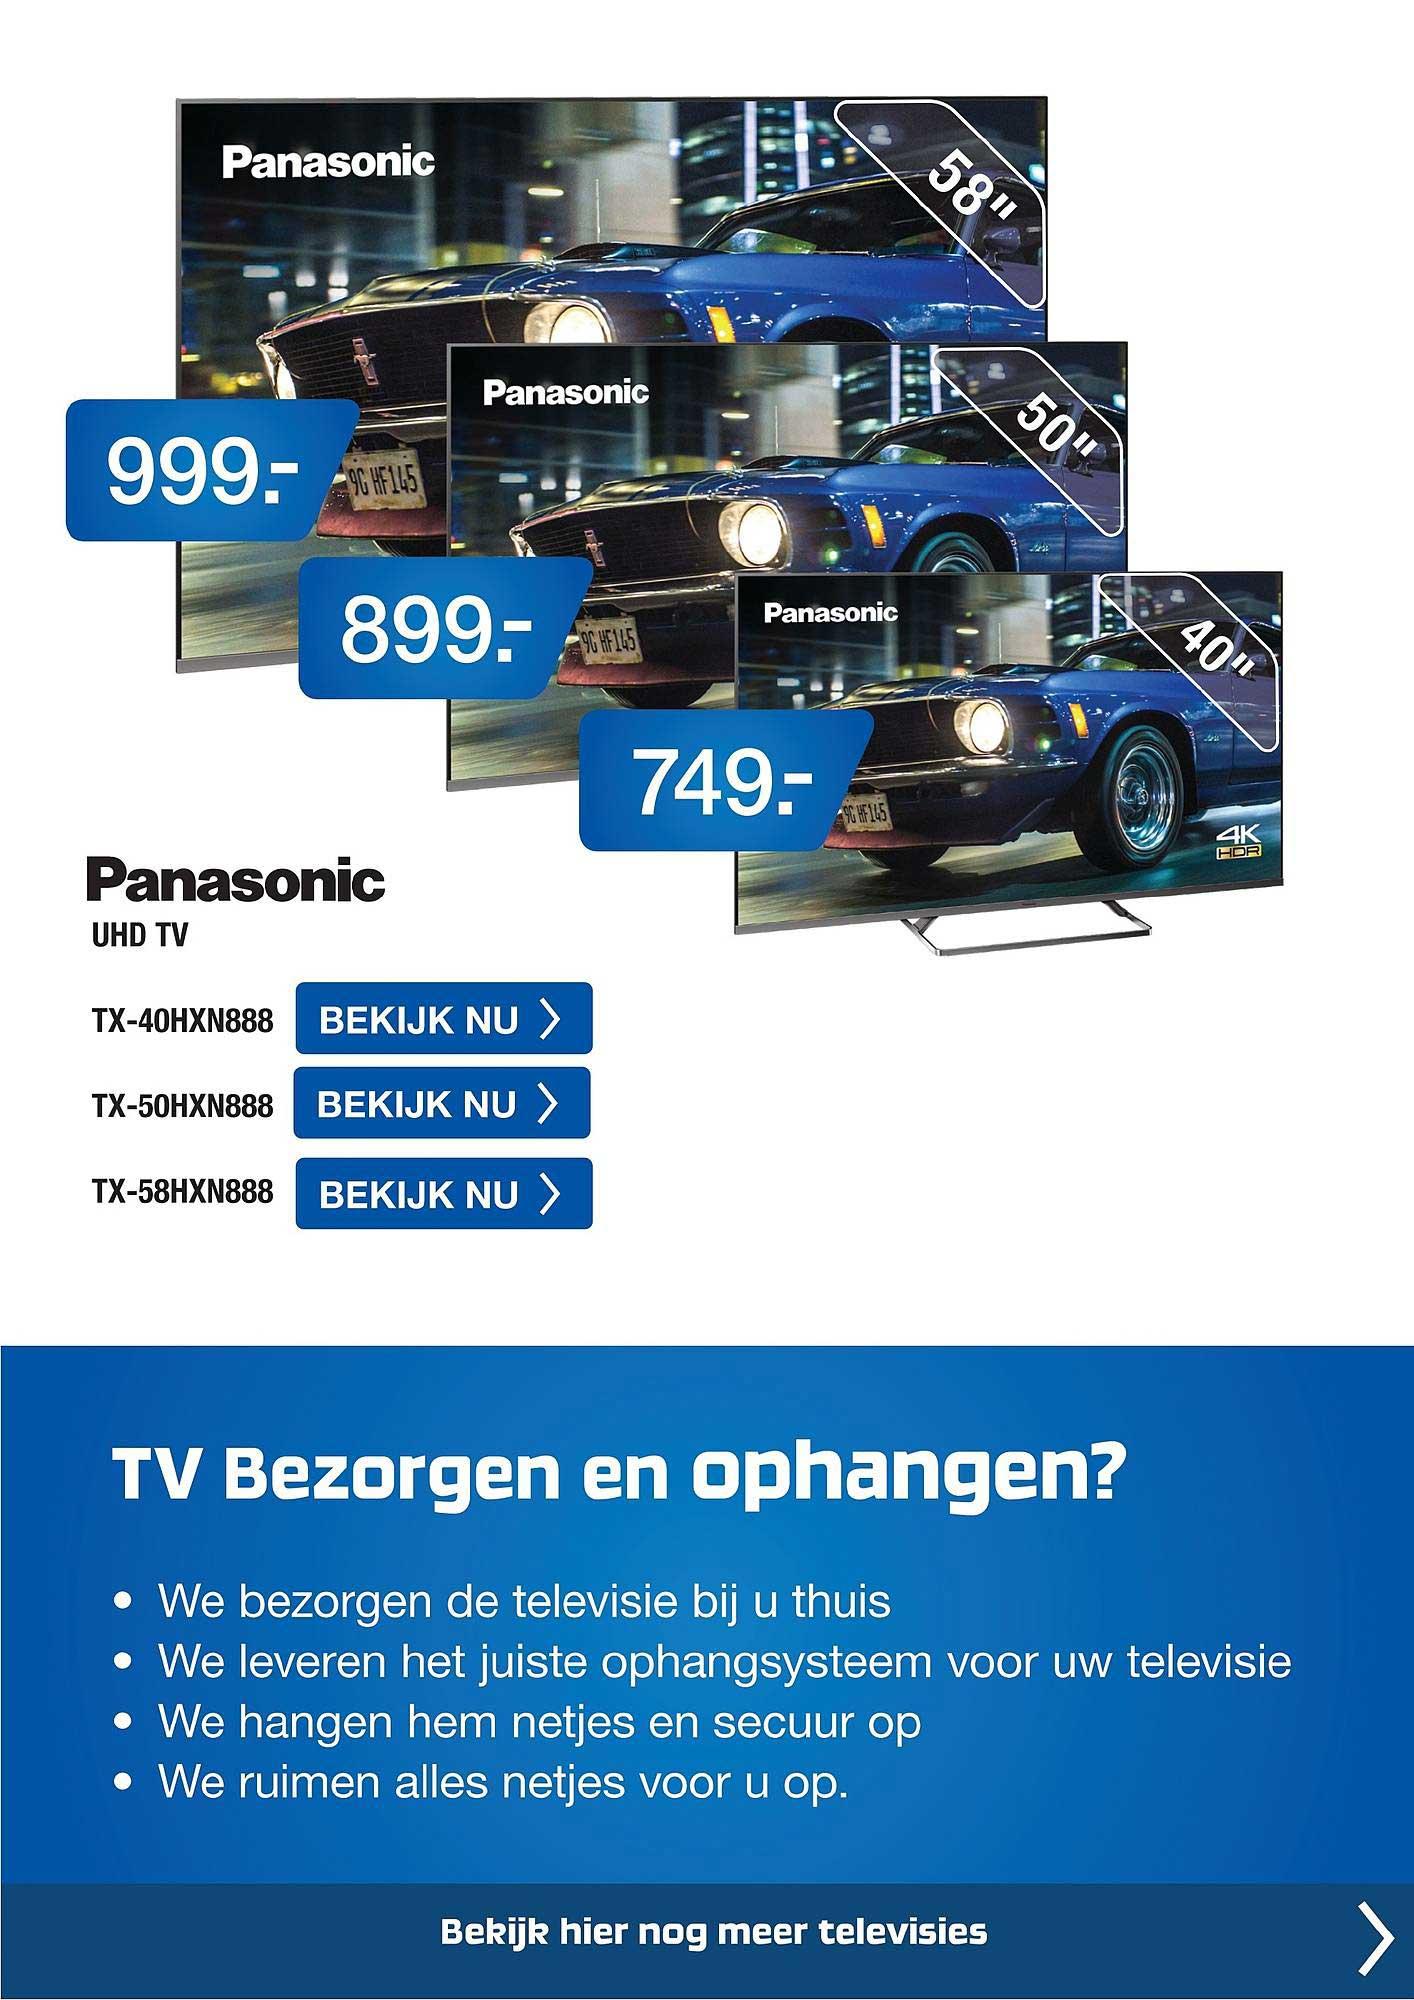 Electro World Panasonic UHD TV TX-40HXN888, TX-50HXN888 Of TX-58HXN888